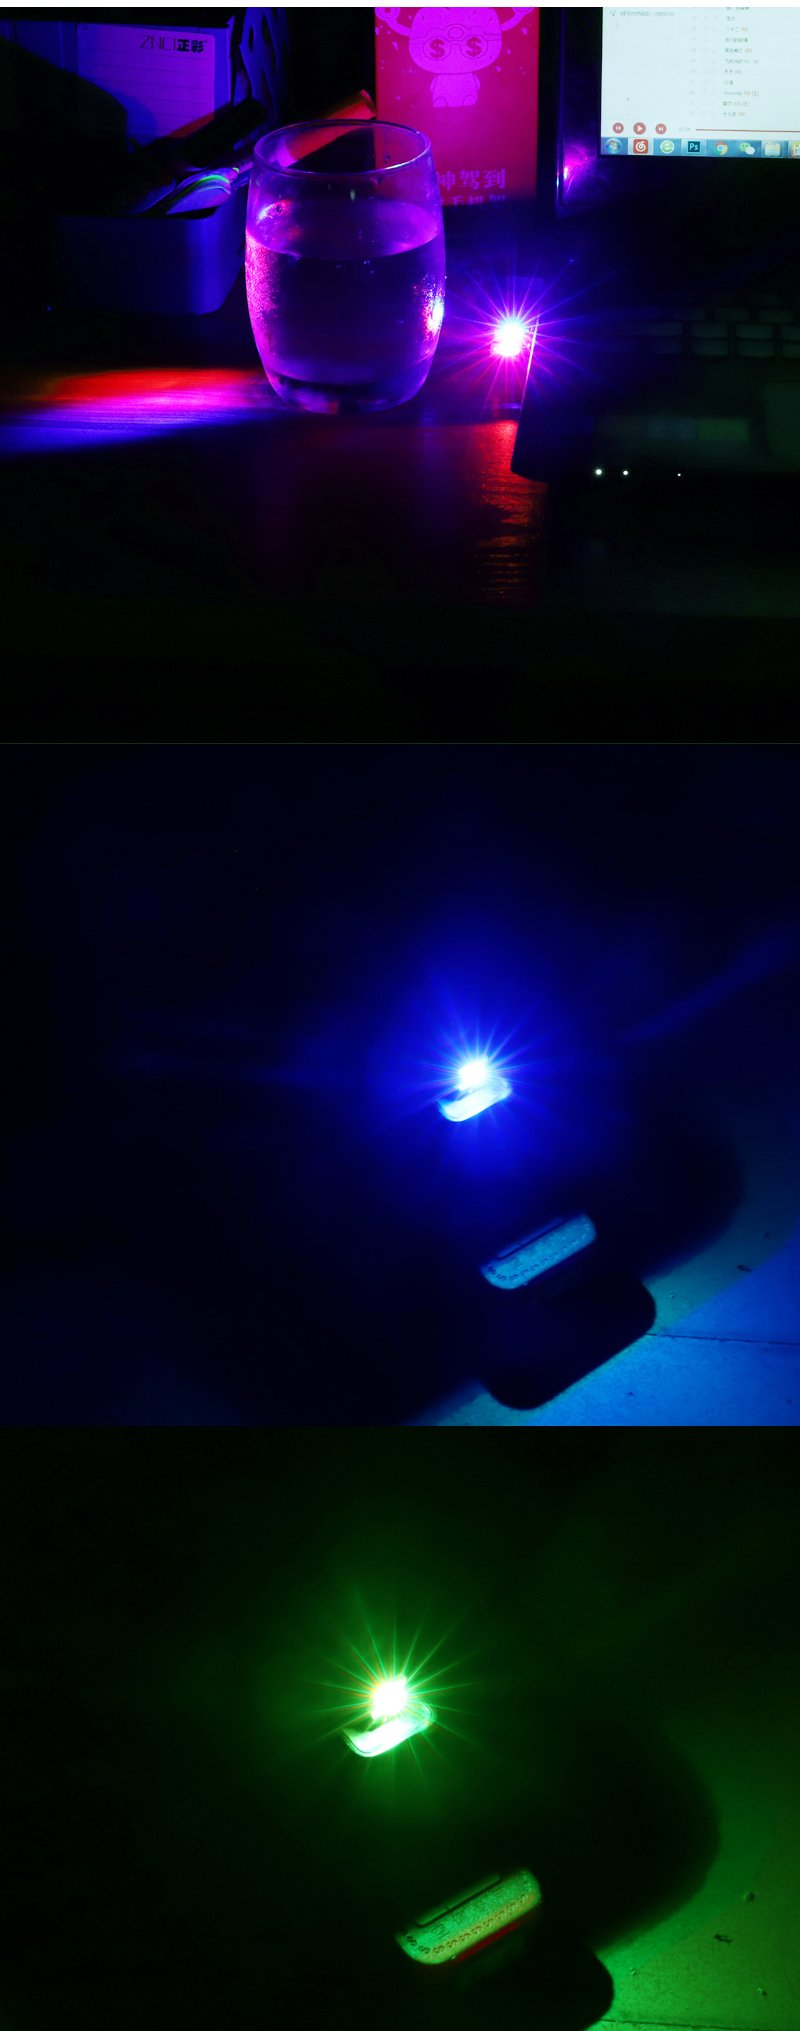 USB Portable Color Atmosphere Lights, LED,Car,Computer and Other USB Jack Scene,Voice Control Color Change Node, Breathing Light Mode, Monochrome Mode, Portable,2g